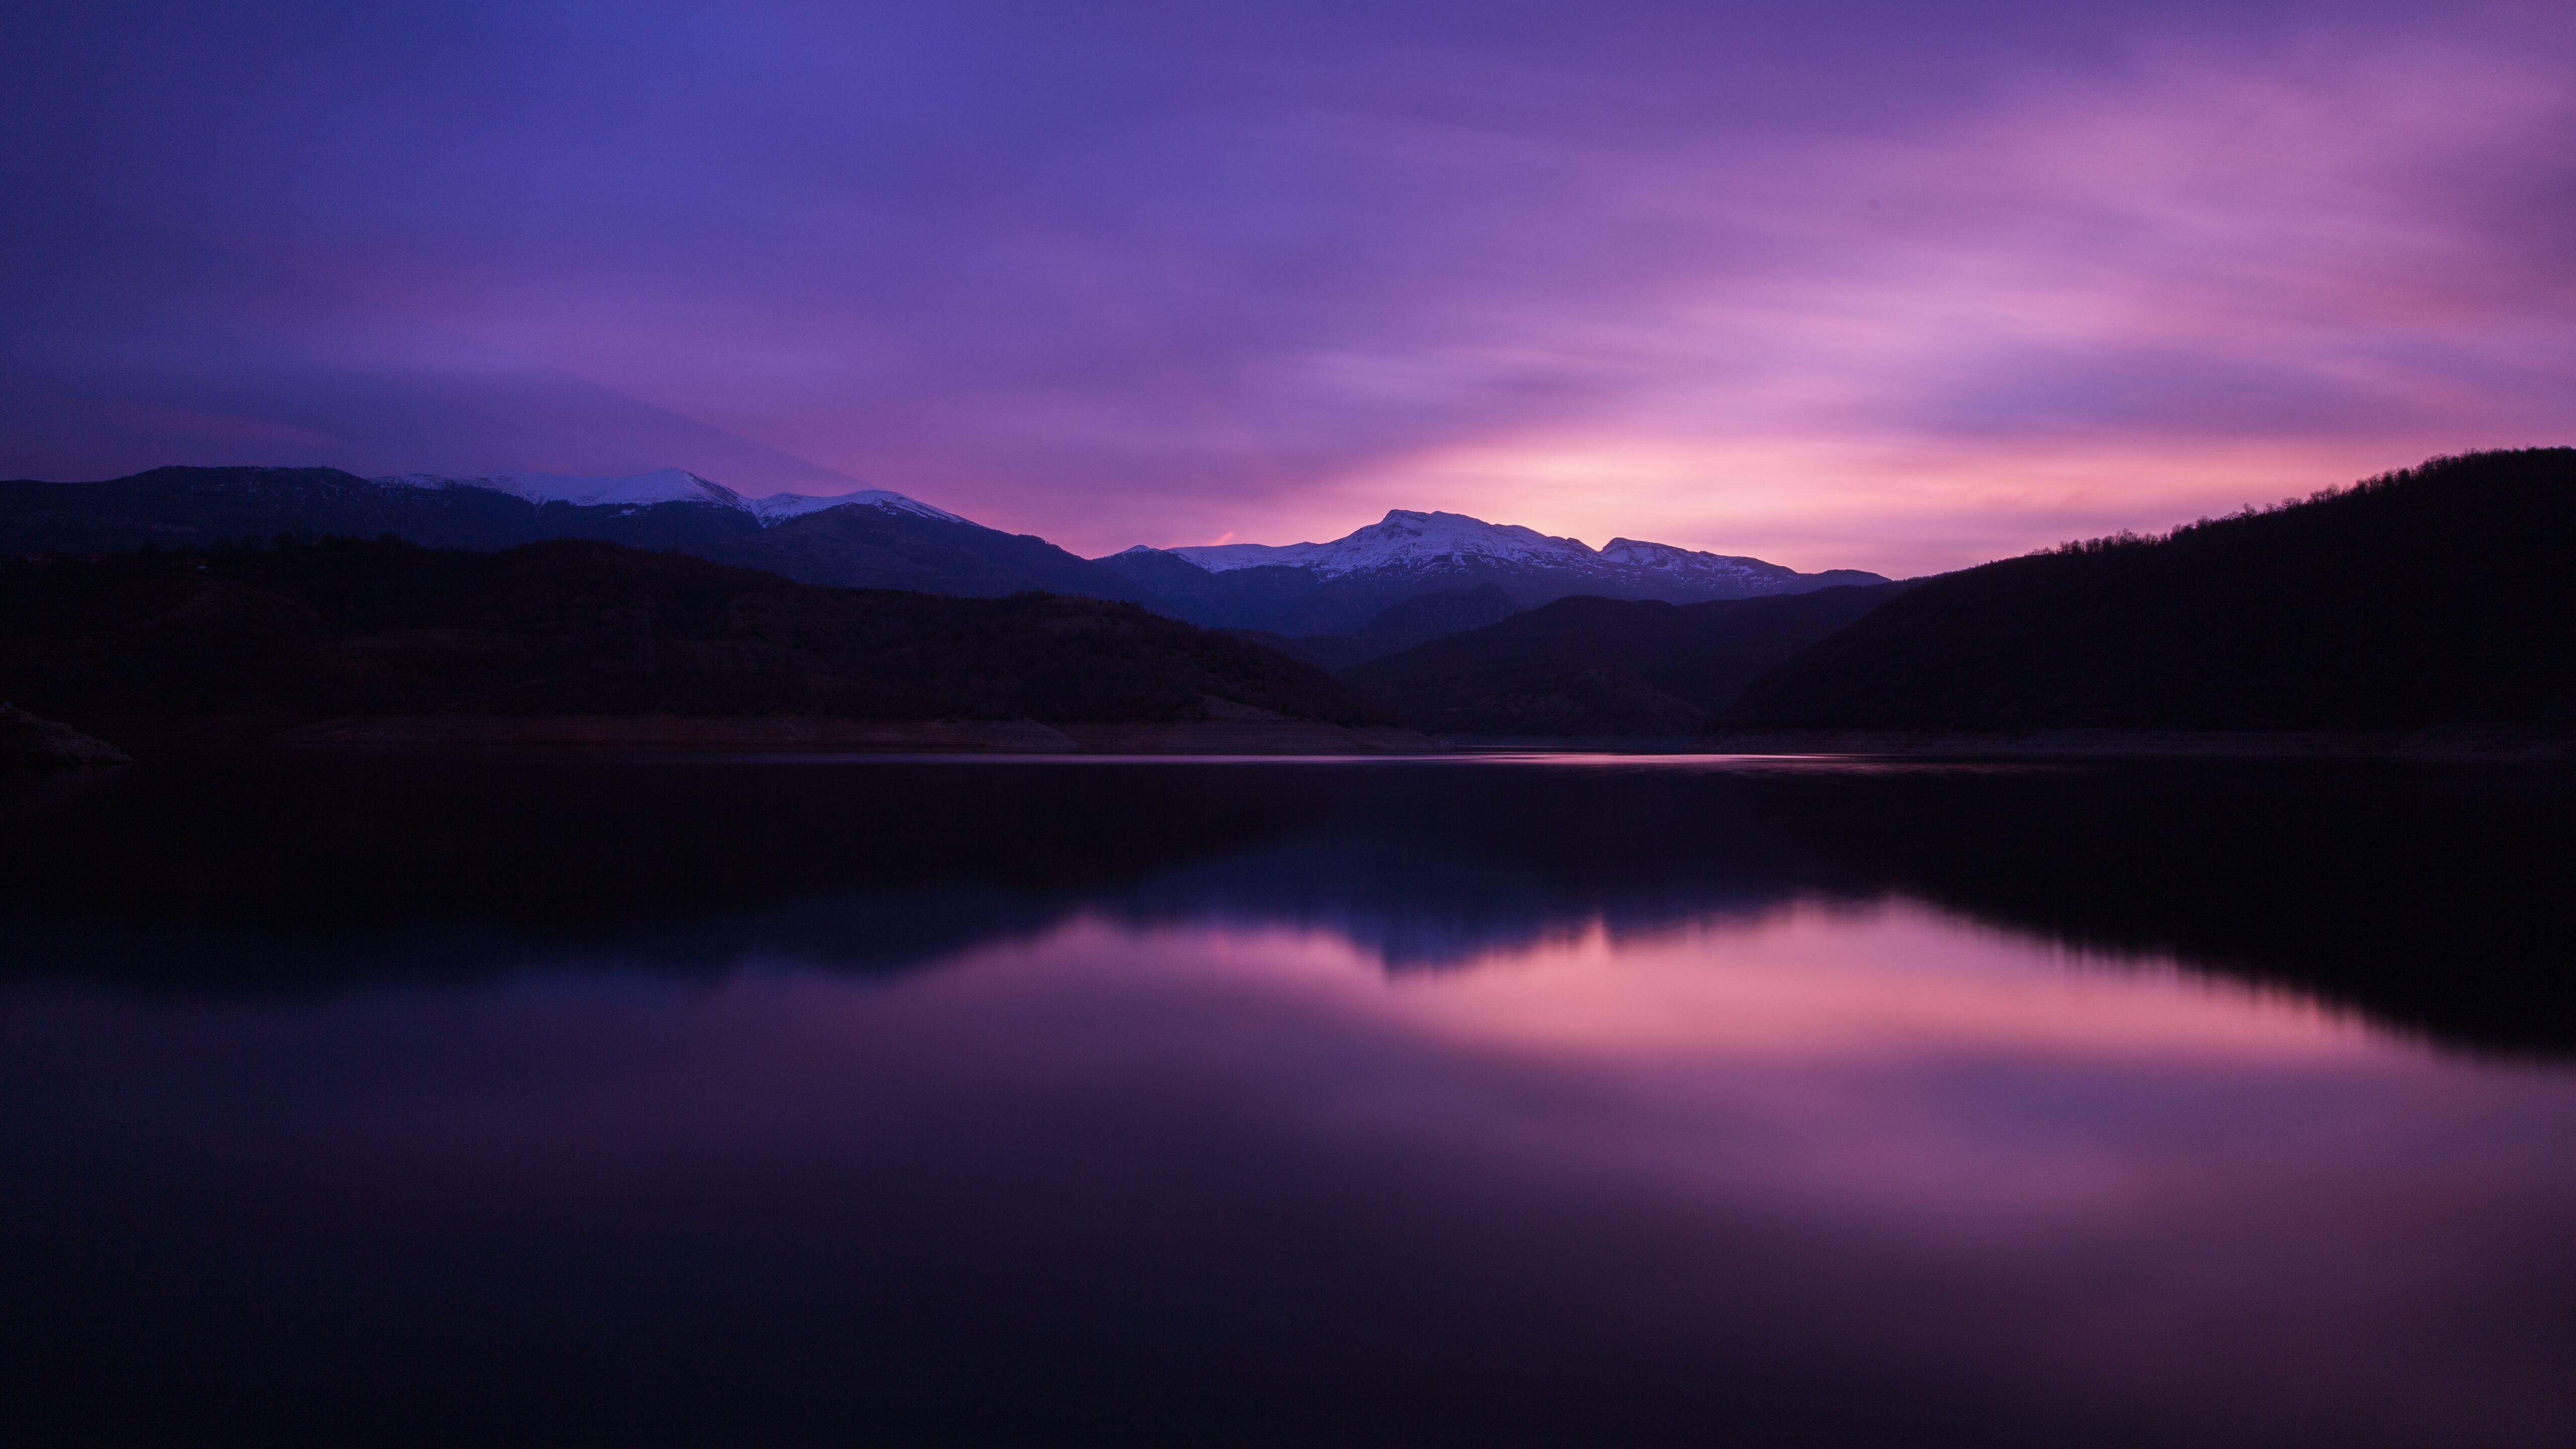 5120x2880 mountain lake night reflection 5k 5k hd 4k - Night mountain wallpaper 4k ...